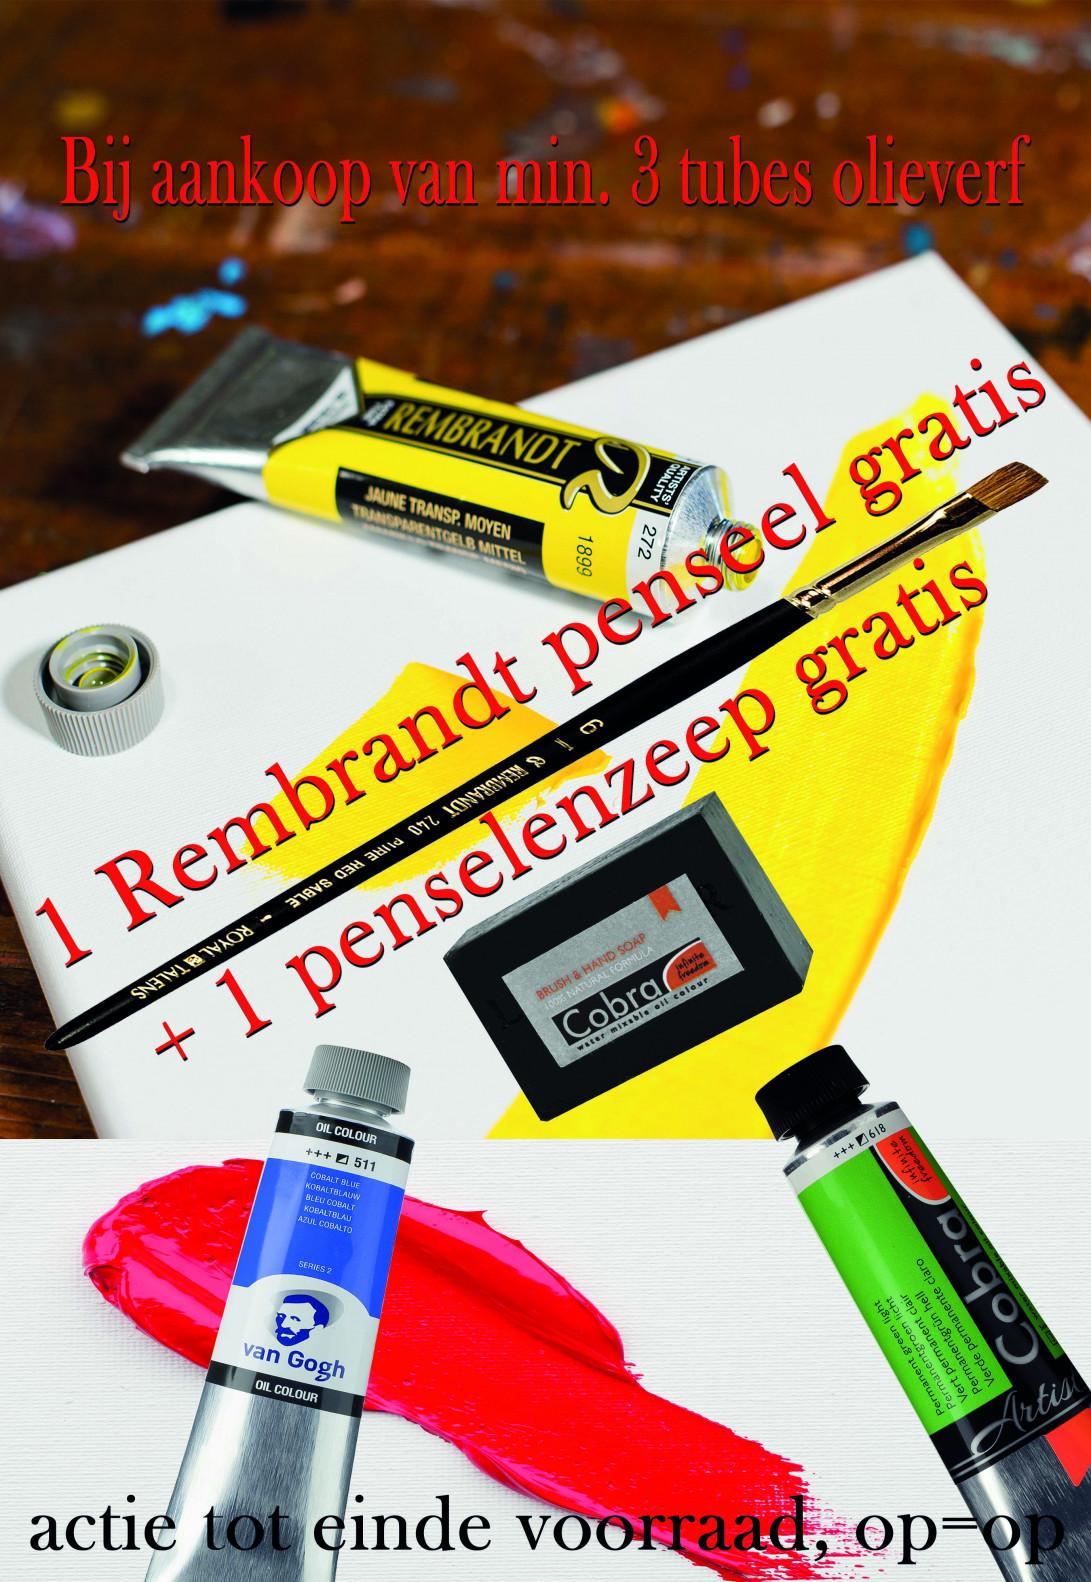 Rembrandt_penseel_gratis.jpg